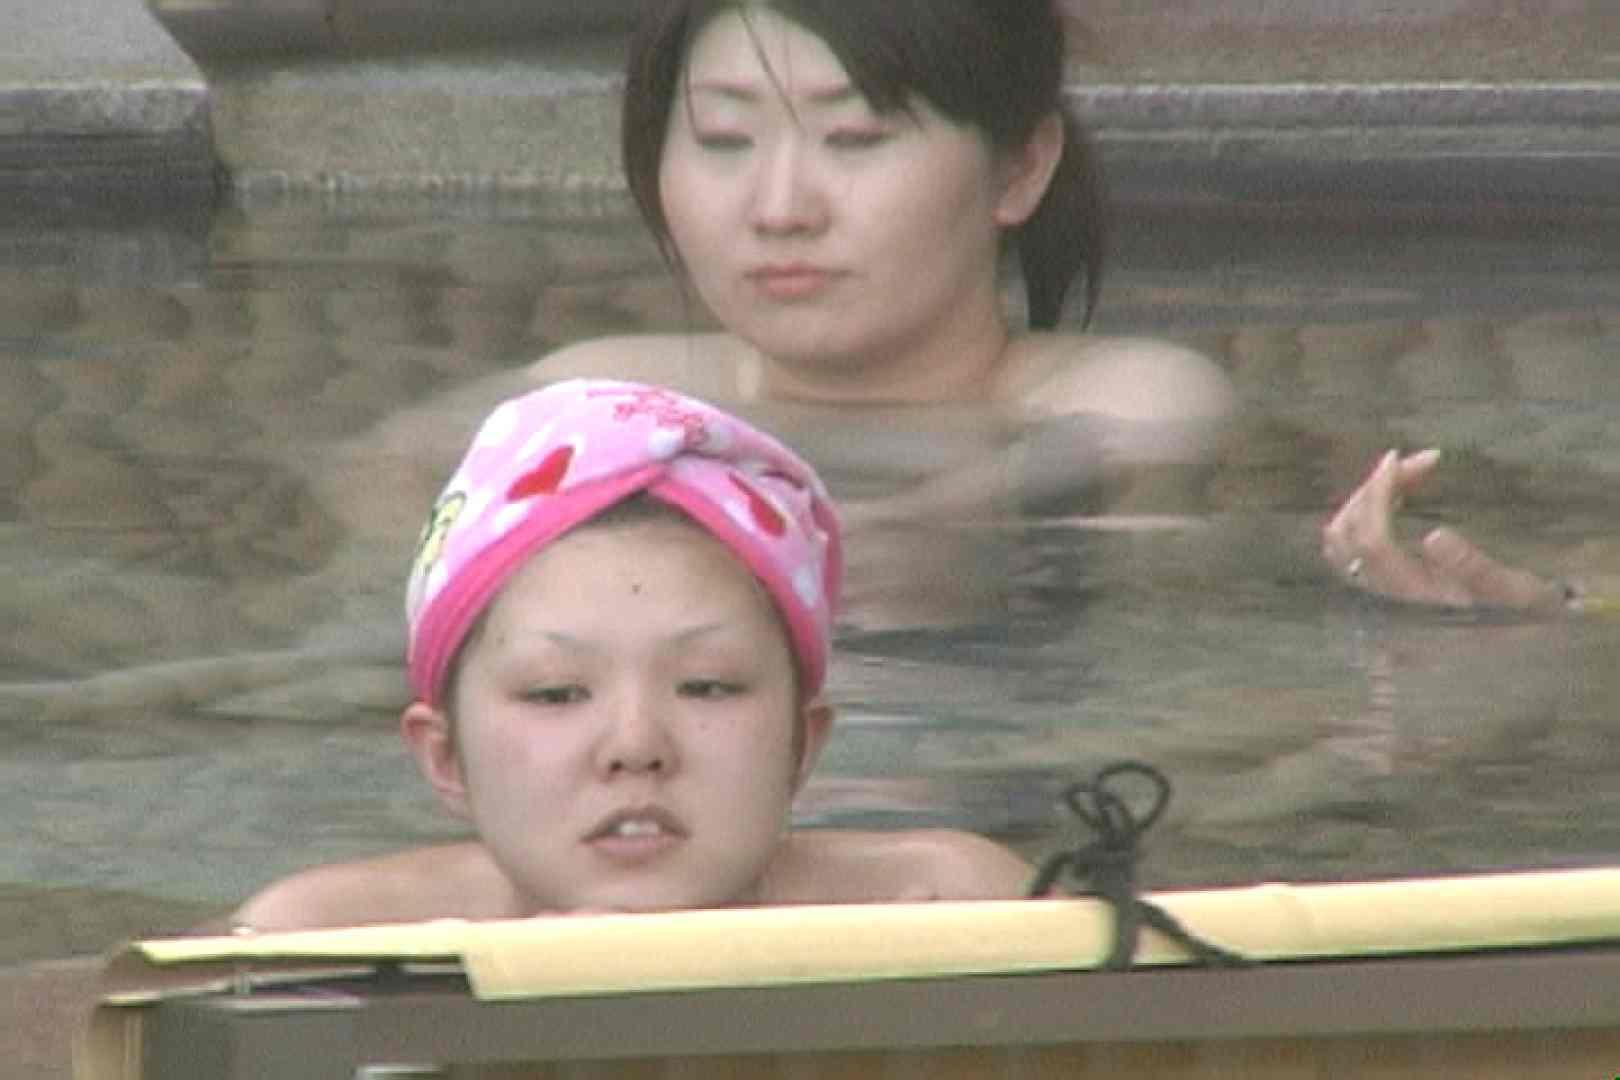 Aquaな露天風呂Vol.25 美しいOLの裸体 おまんこ無修正動画無料 72pic 41